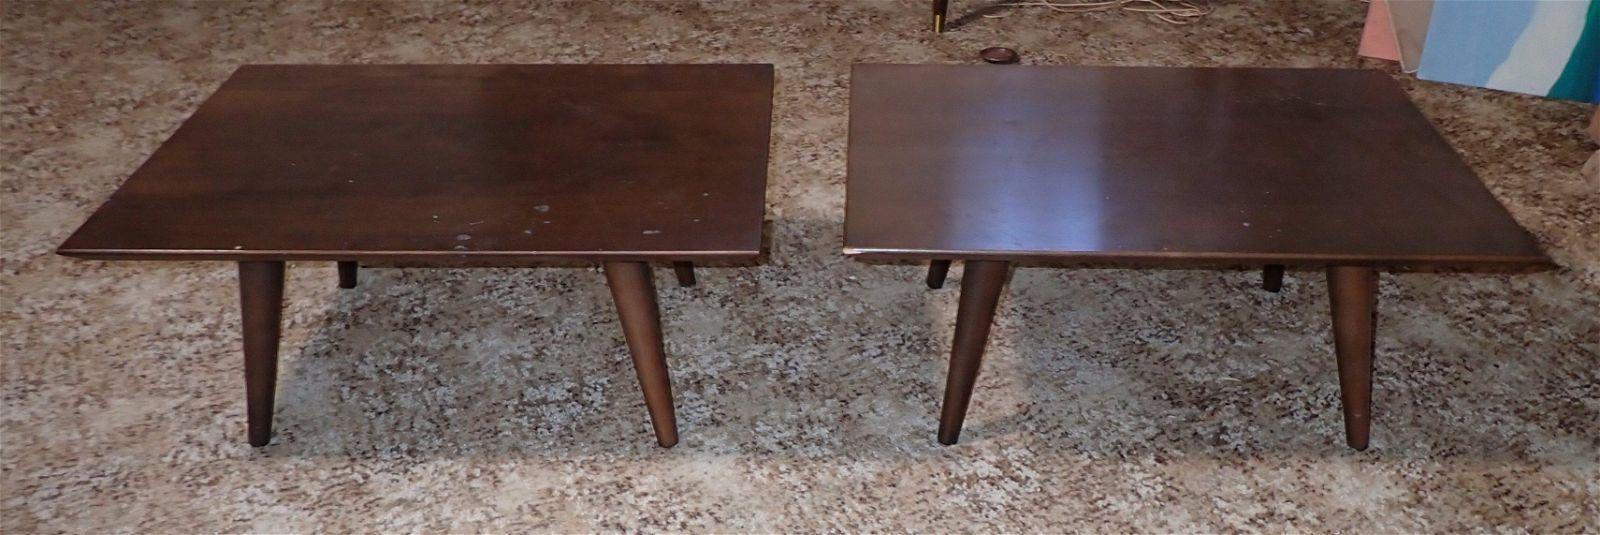 Paul McCobb Mid Century Modern Tables